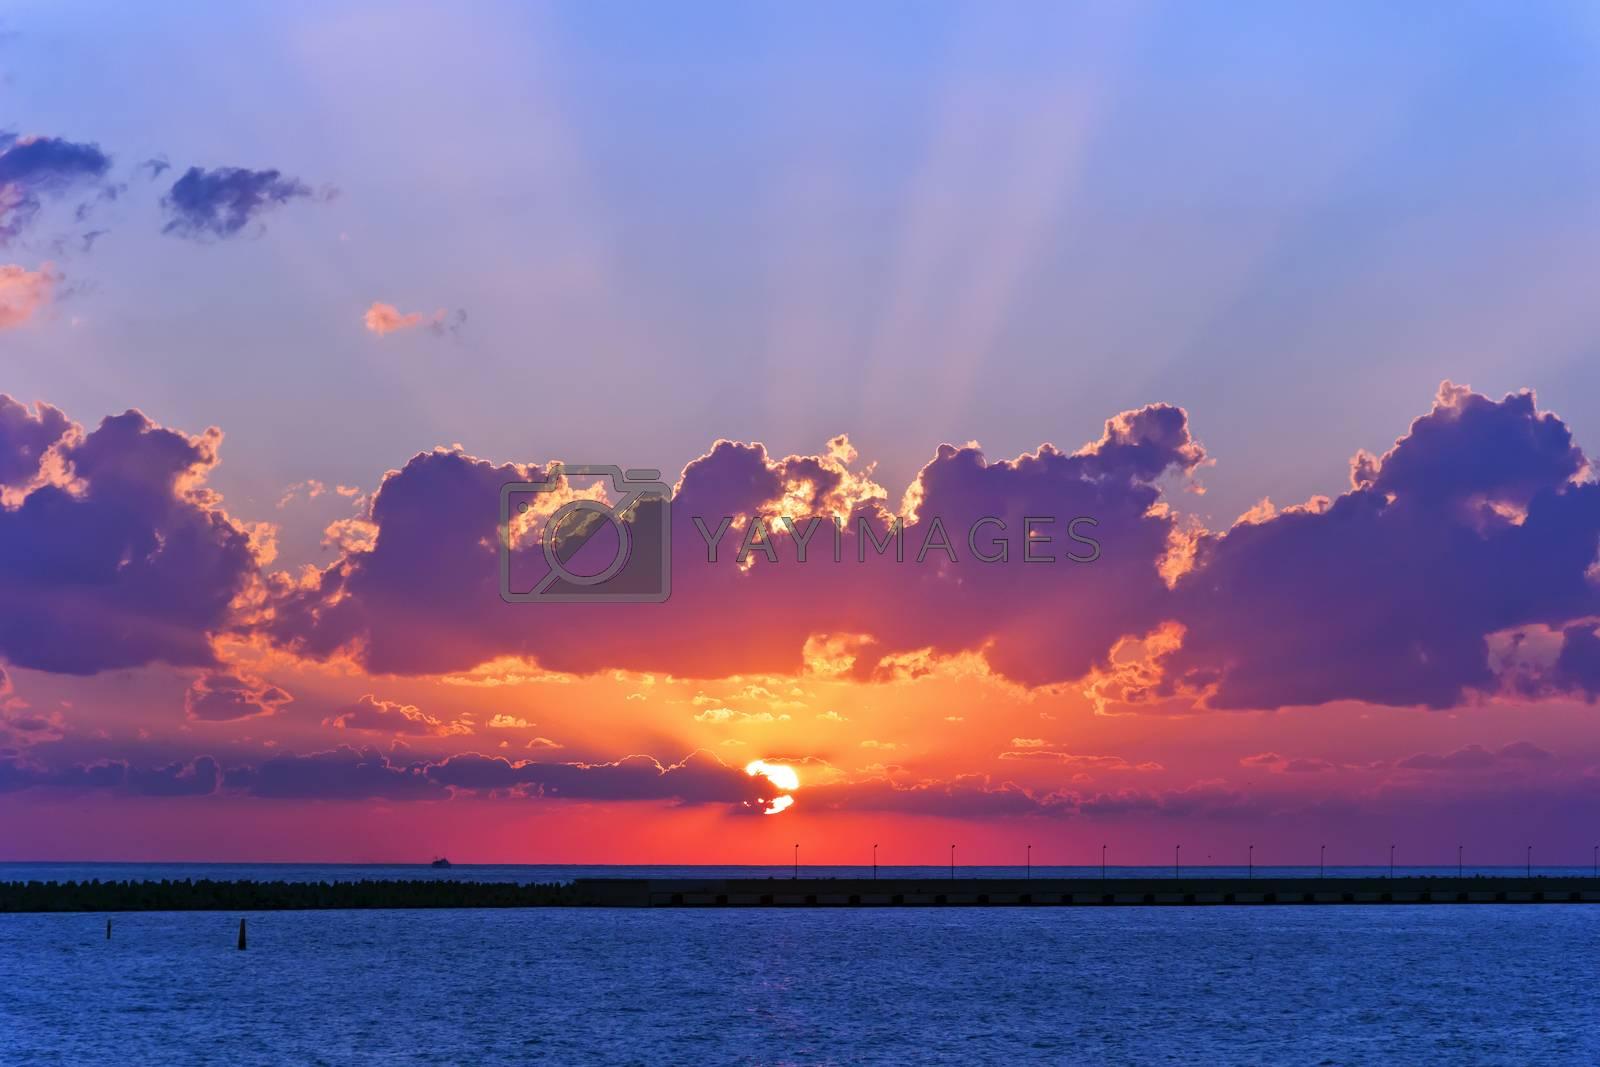 Lanscape evening calm sea with purple sunset